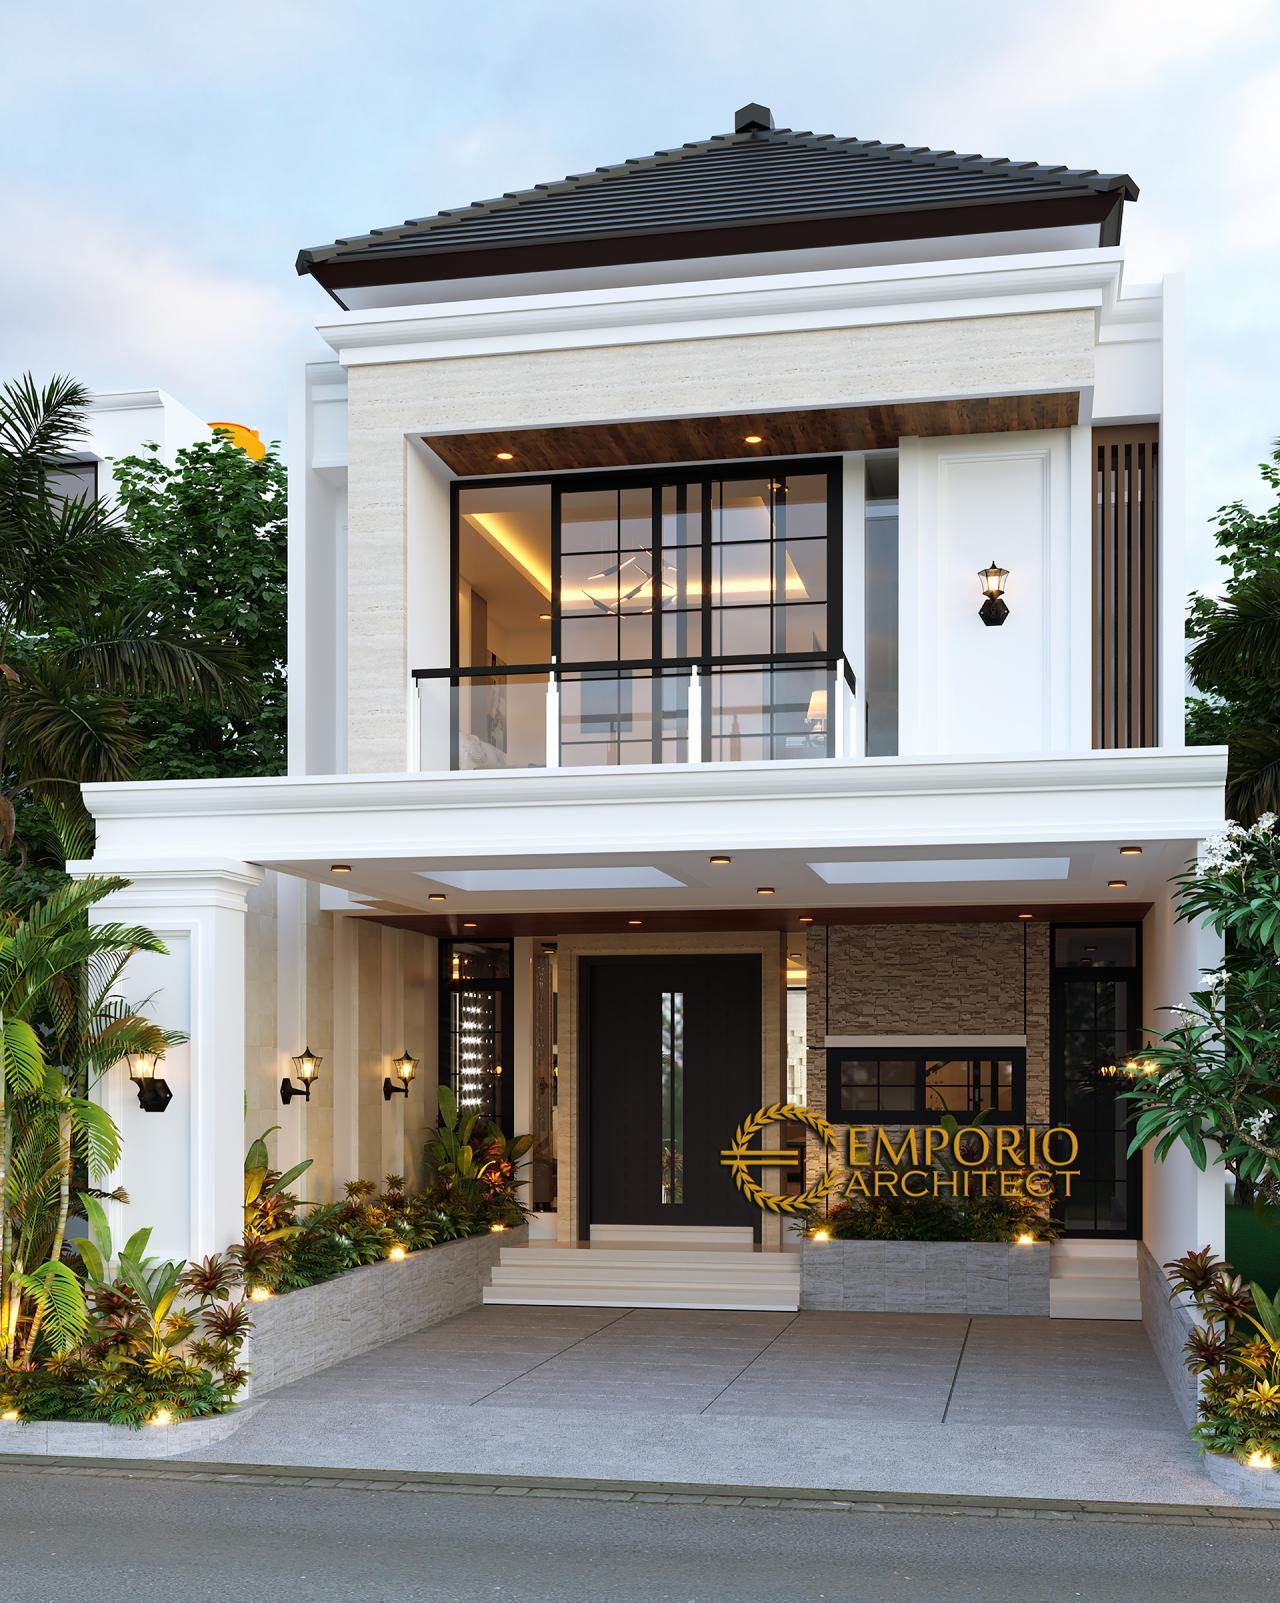 Desain Rumah Modern Classic 2 5 Lantai Bapak Dwi Di Jakarta Selatan